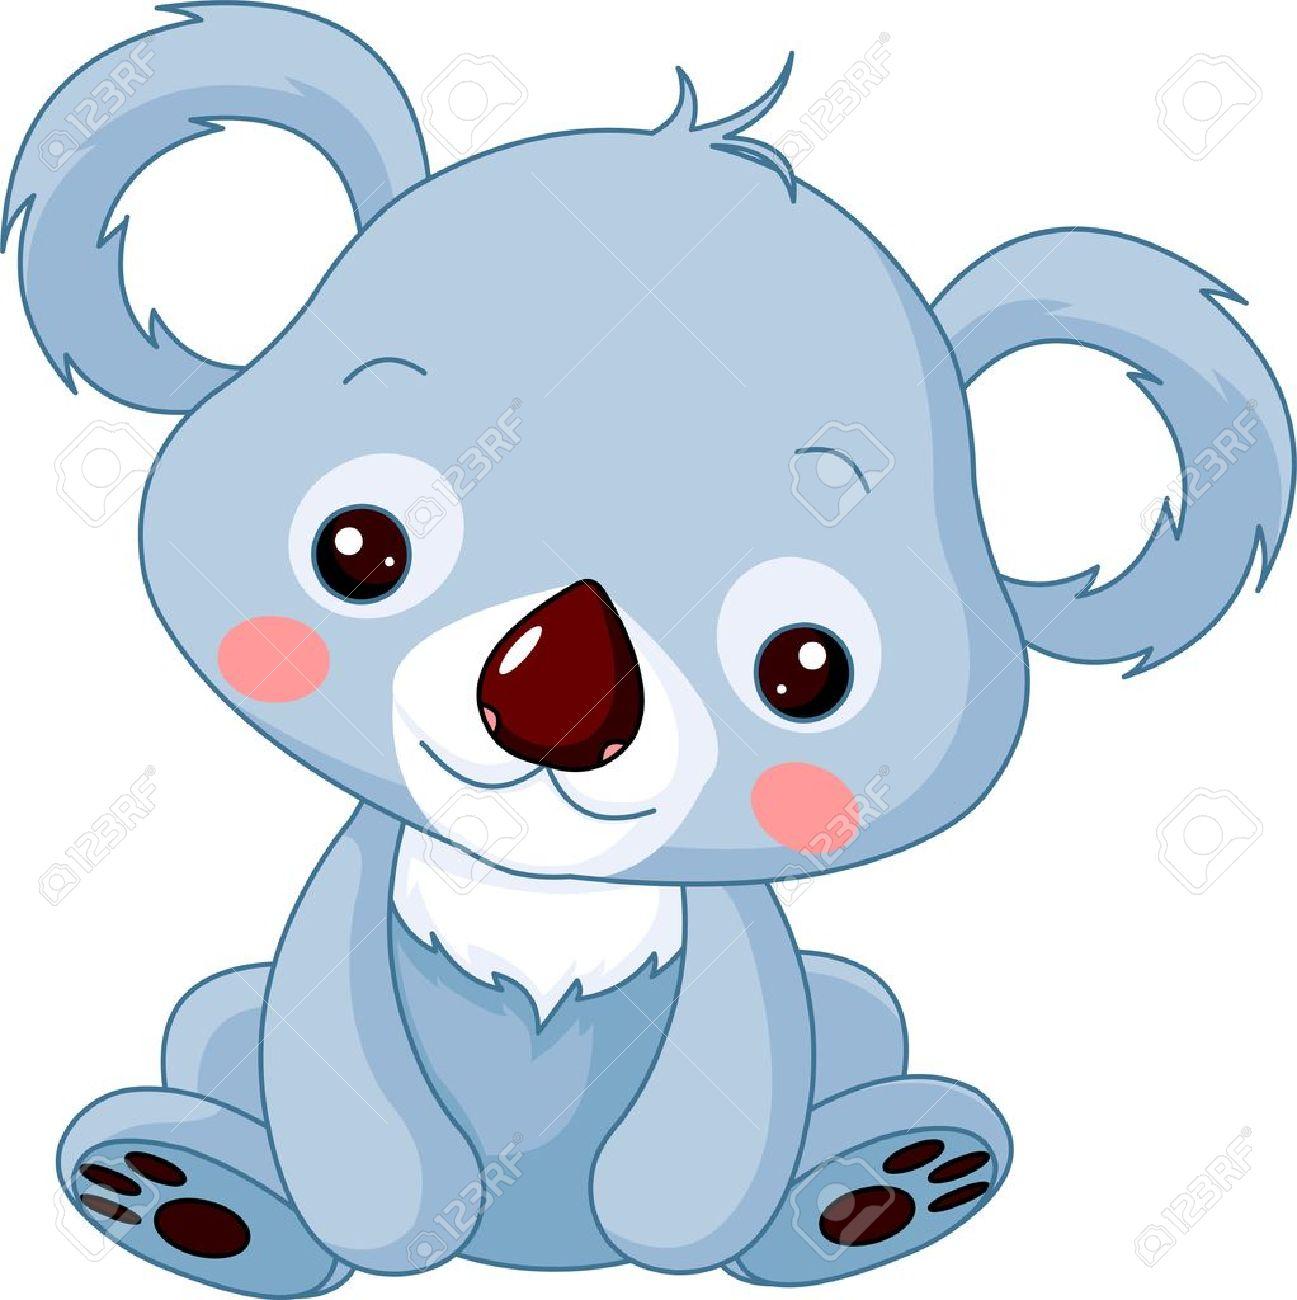 hight resolution of illustration of cute koala bear stock vector 12061278